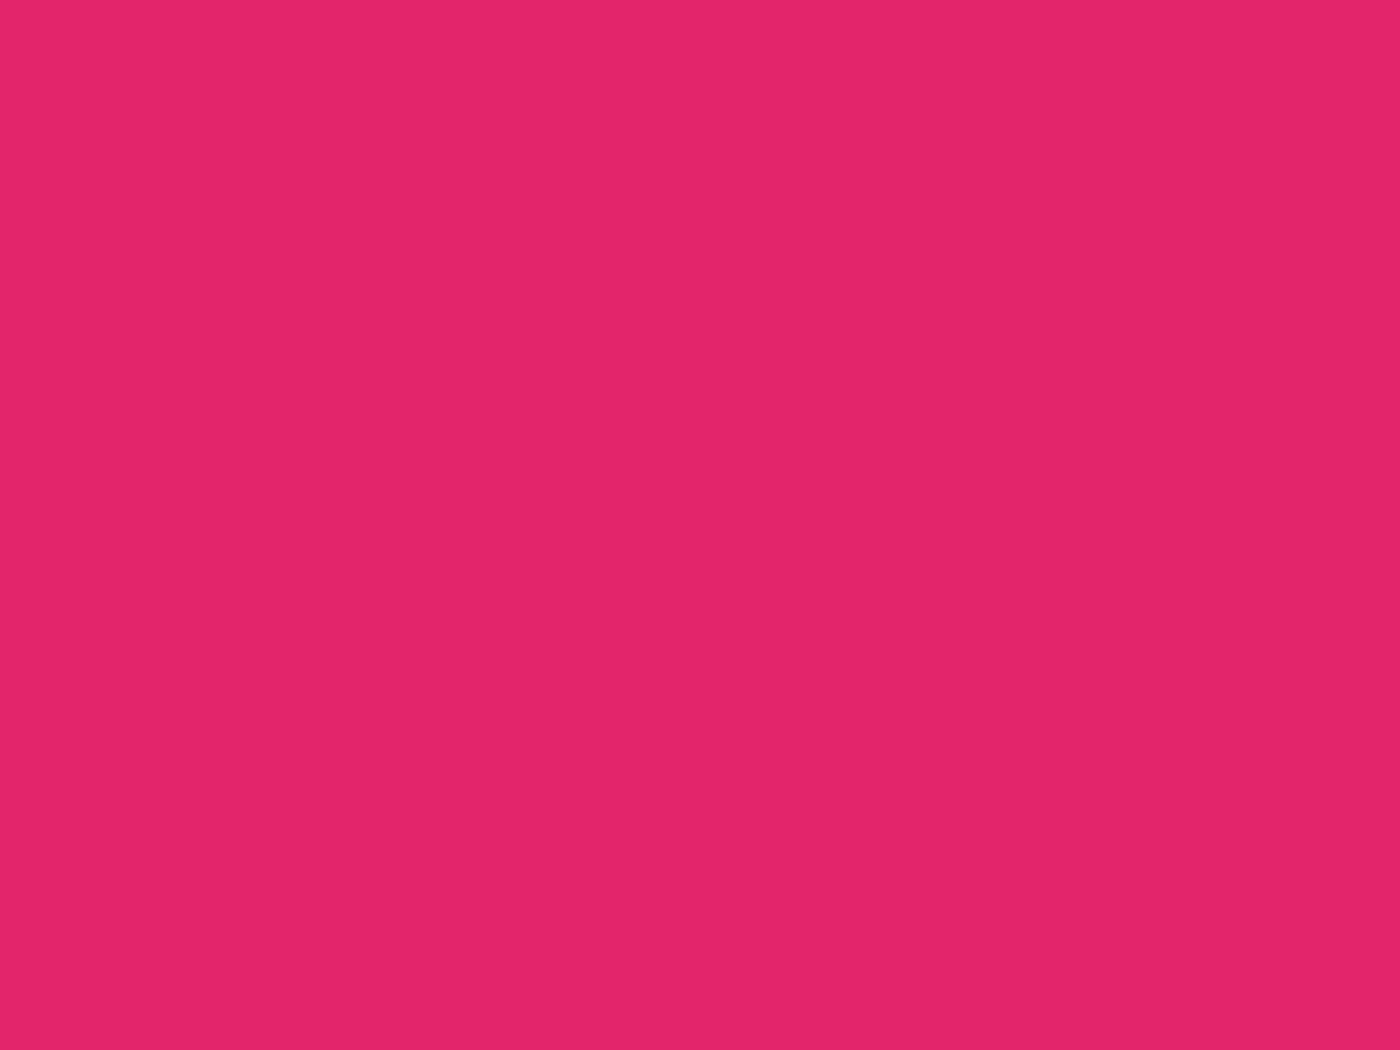 1400x1050 Razzmatazz Solid Color Background